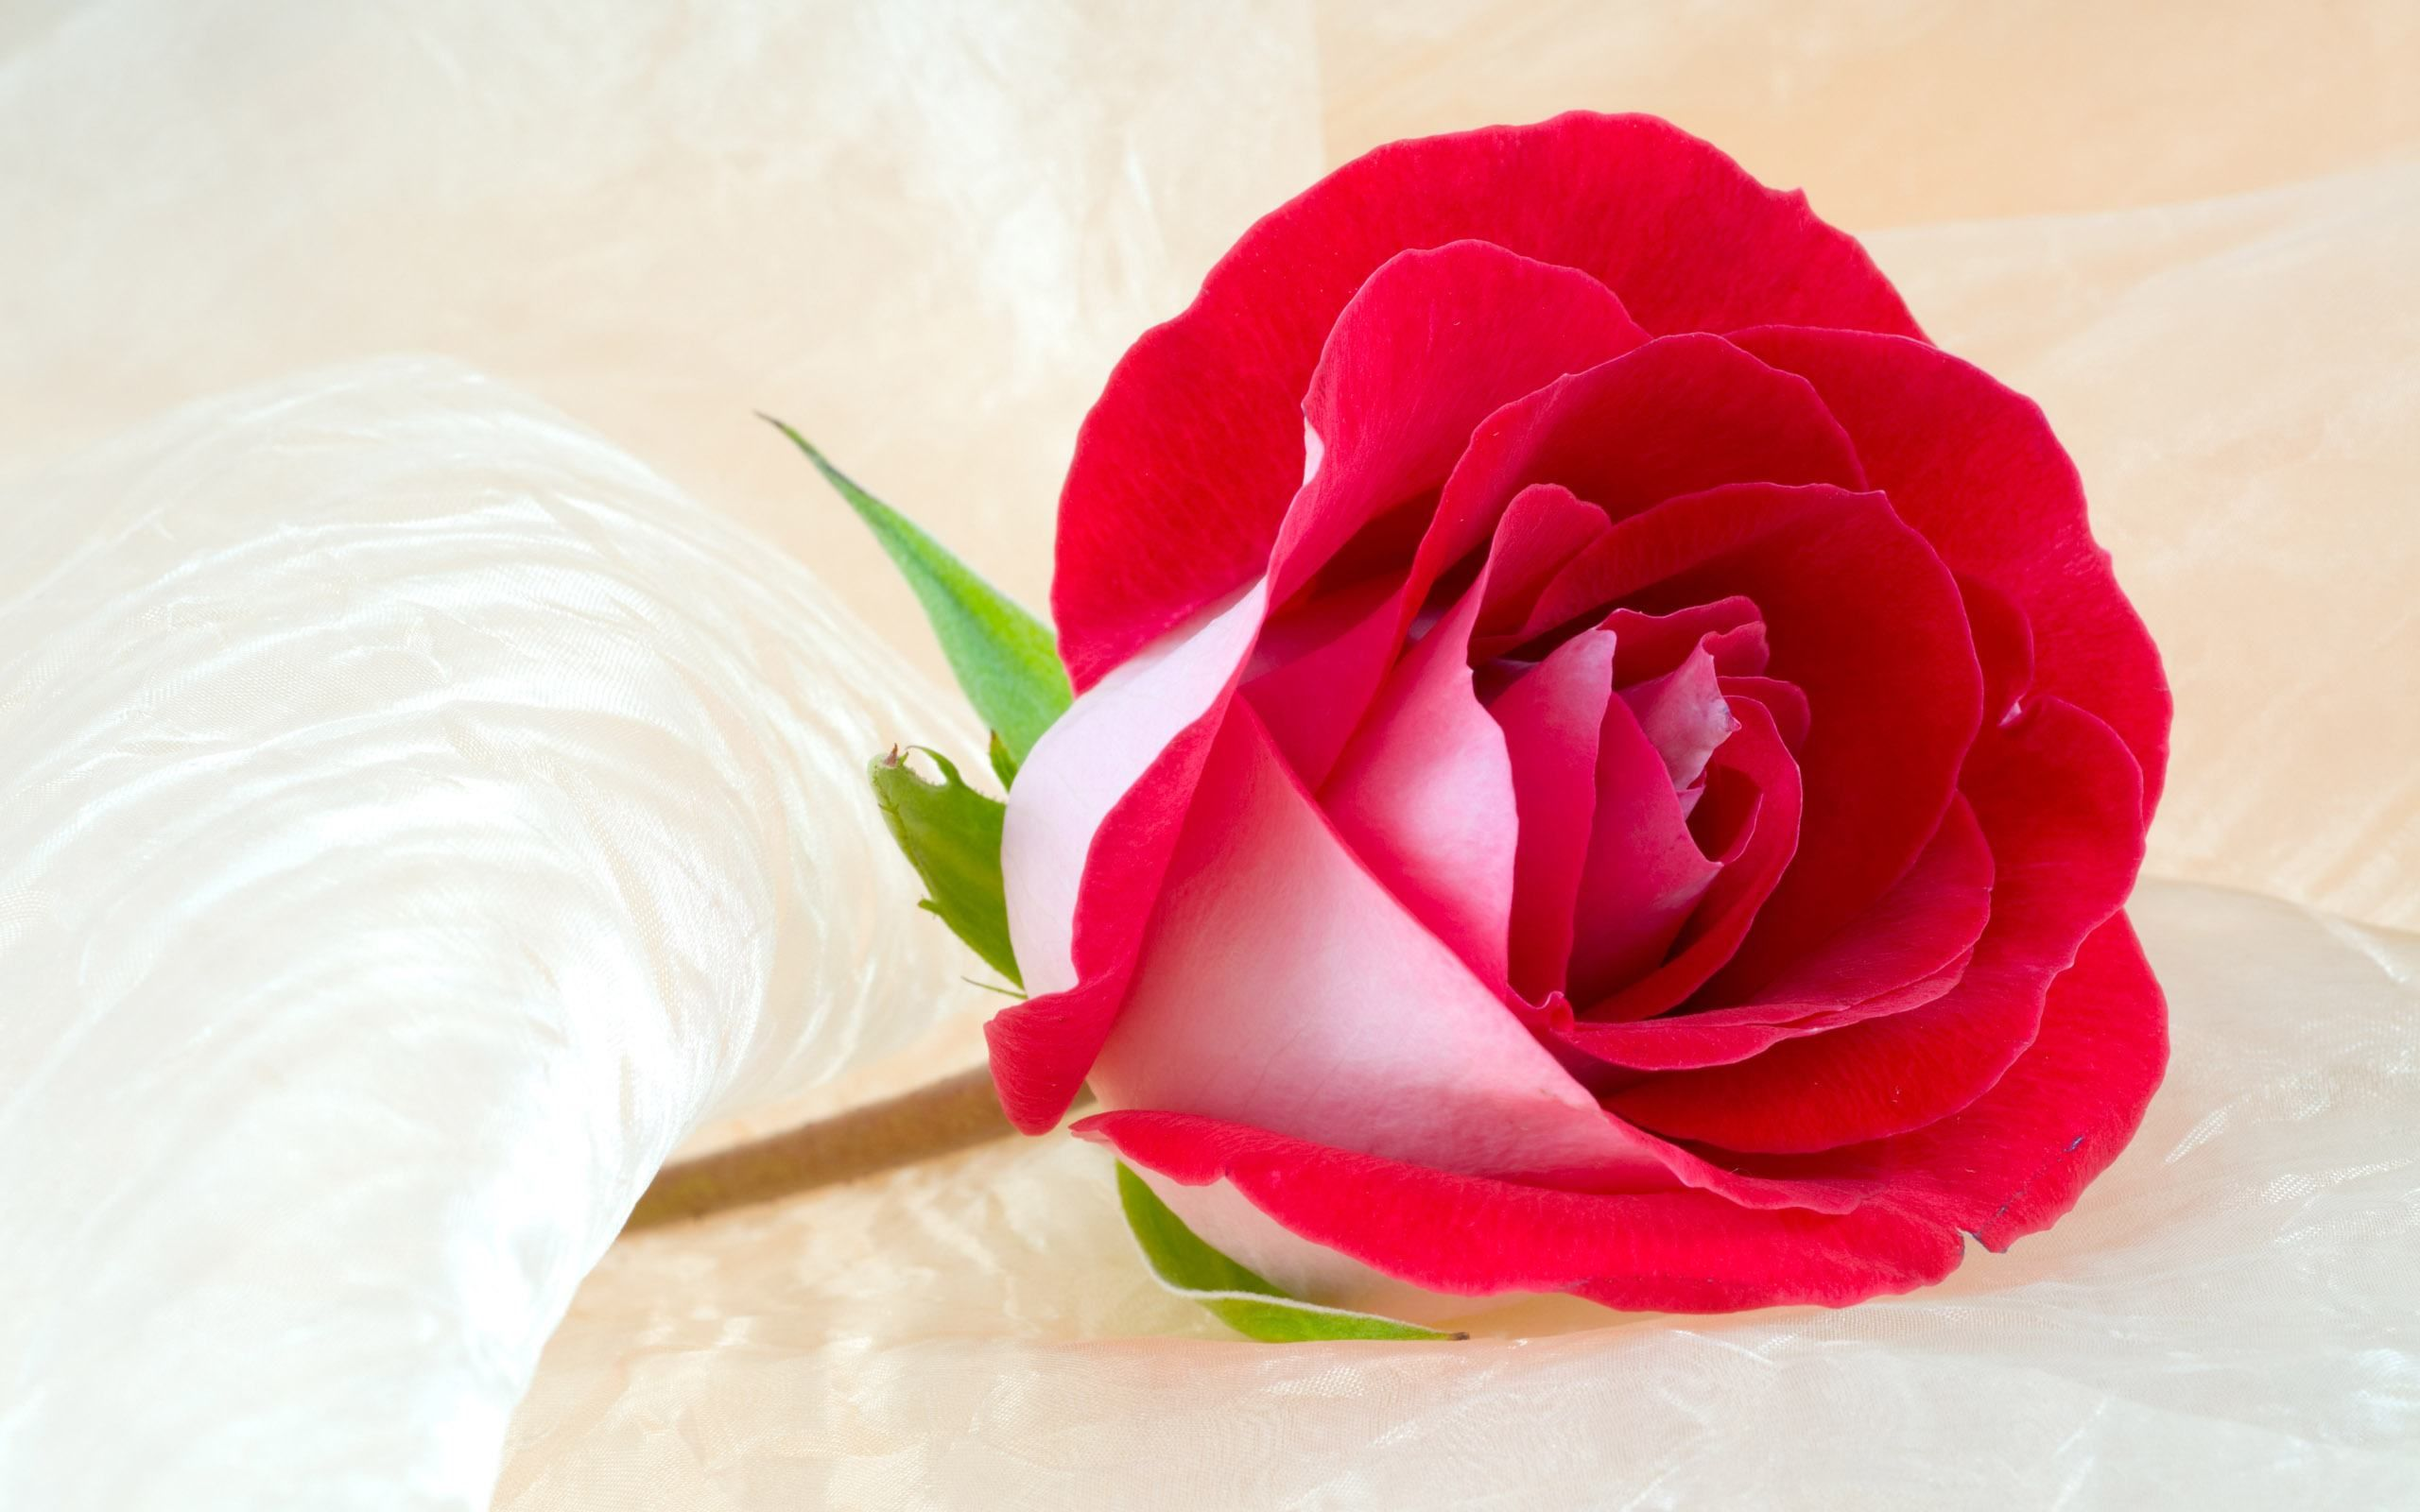 Permalink to Rose Flower Wallpaper Hd Free Download